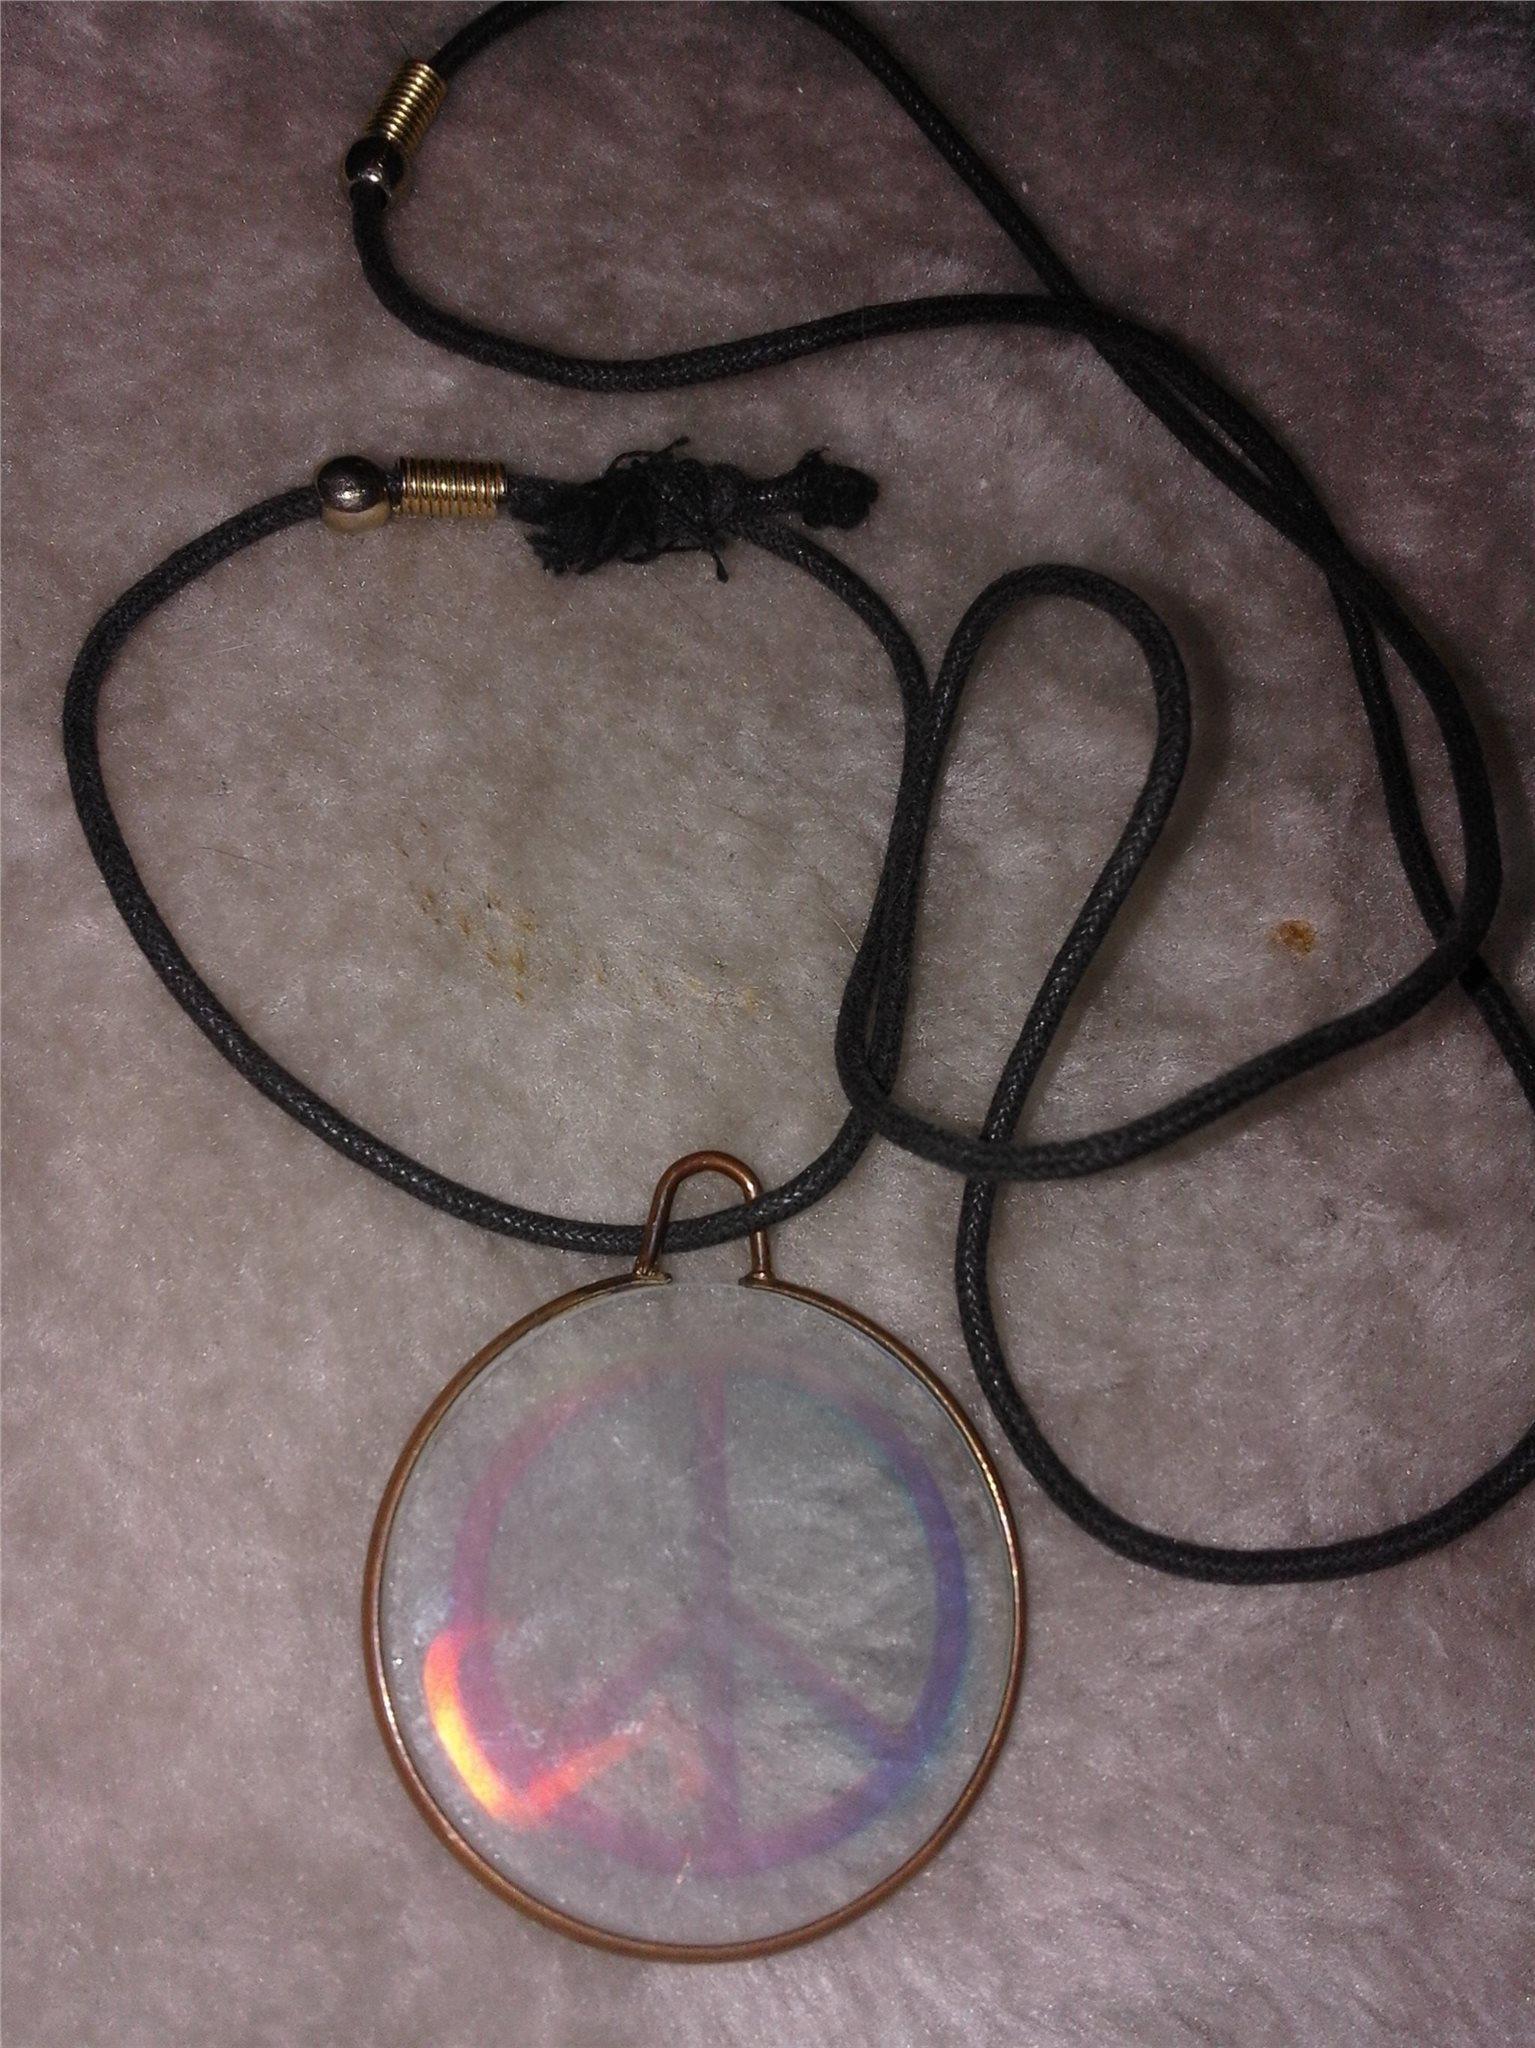 Peace halsband (333564074) ᐈ Köp på Tradera 76838bffce438